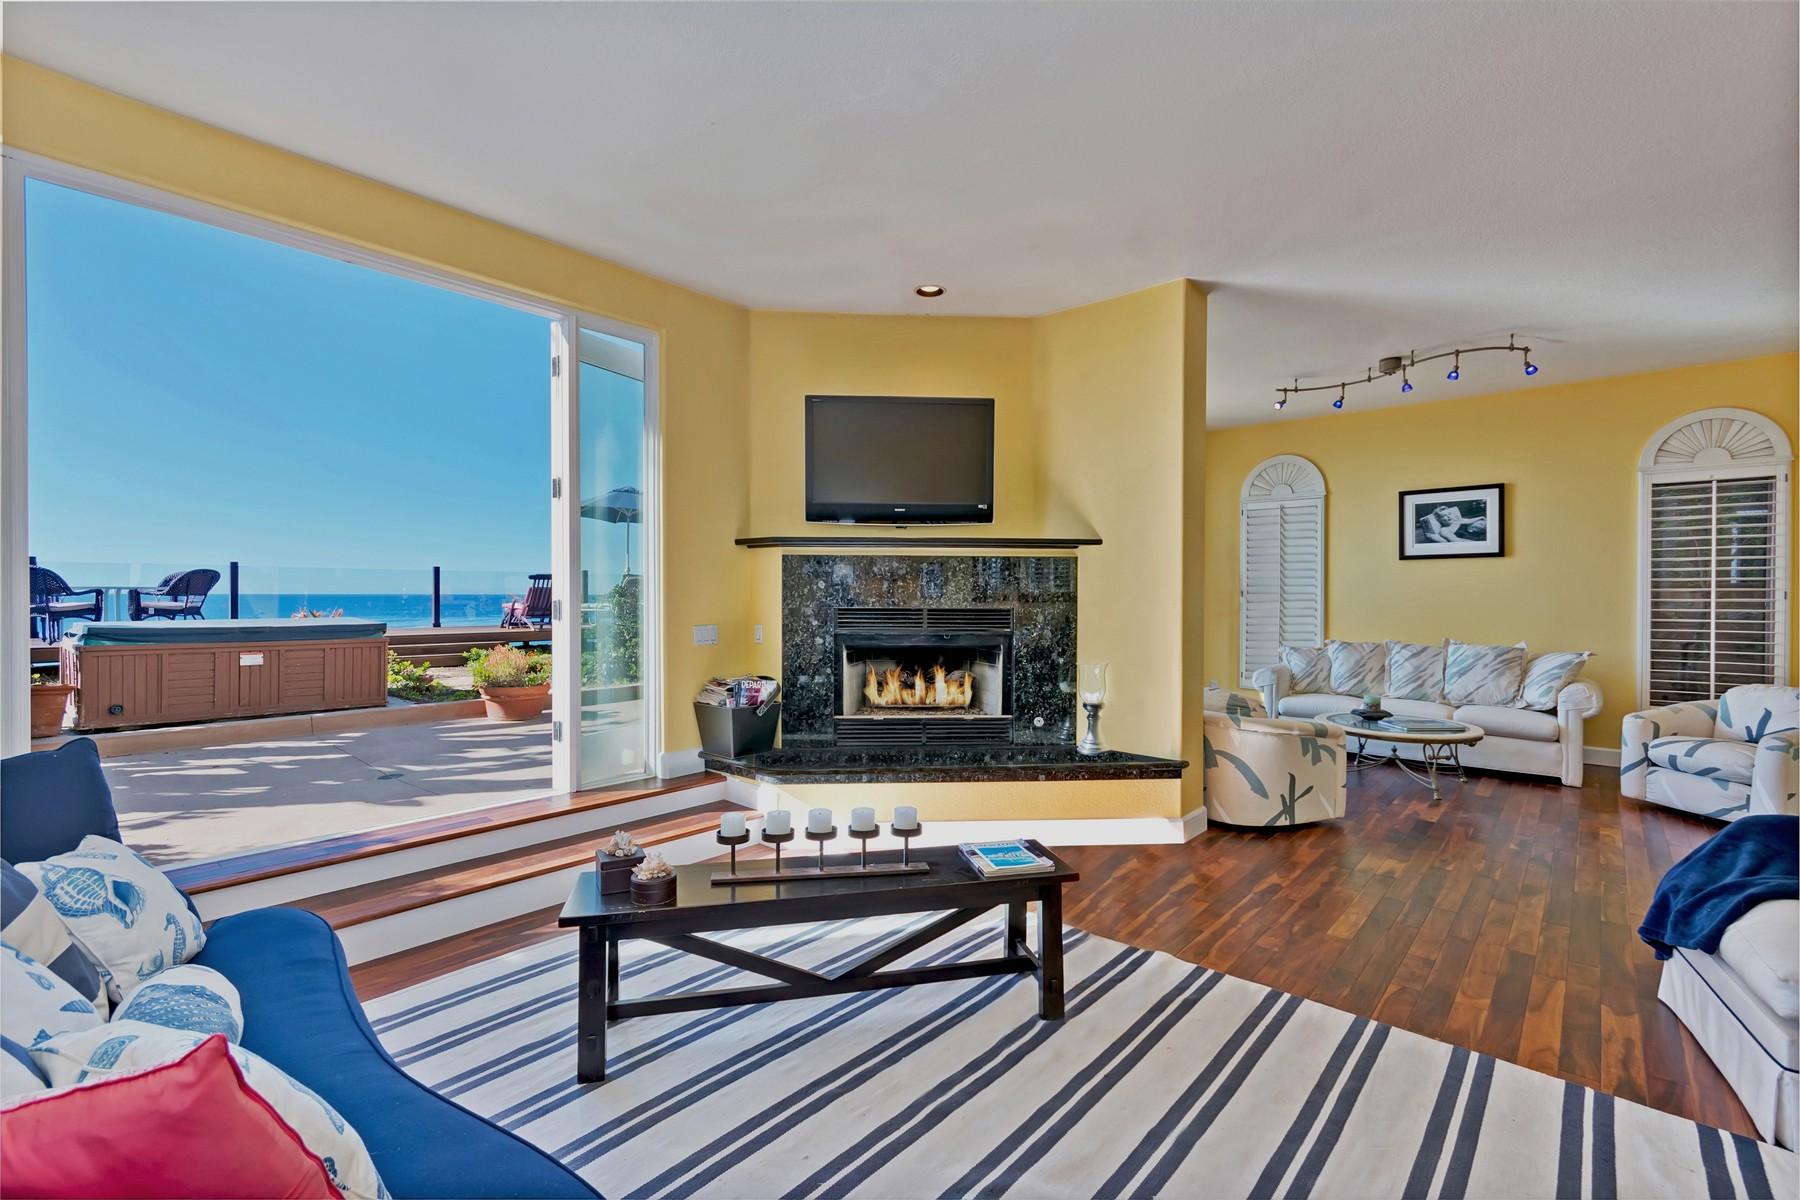 Single Family Home for Sale at 304 Neptune Avenue Encinitas, California 92024 United States